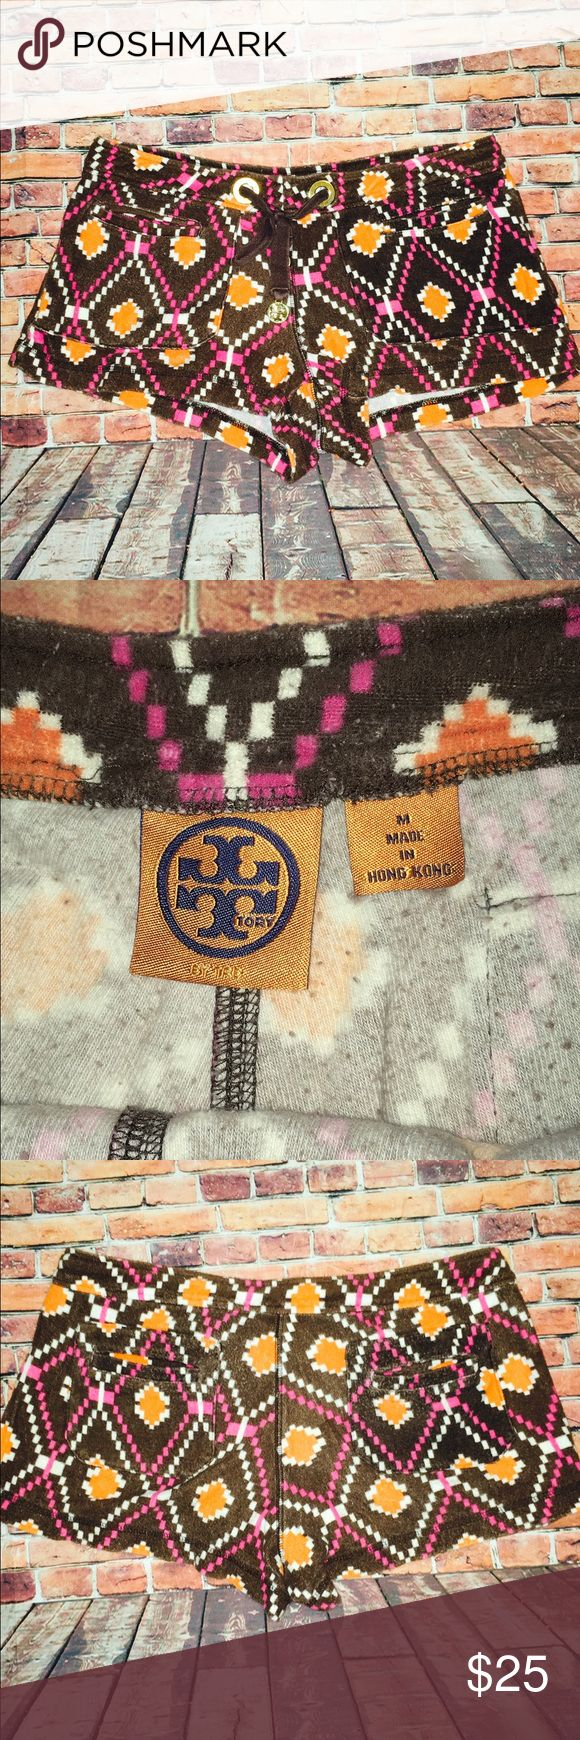 Tory Burch Aztec Print Shorts super cute and comfty. Tory Burch Shorts